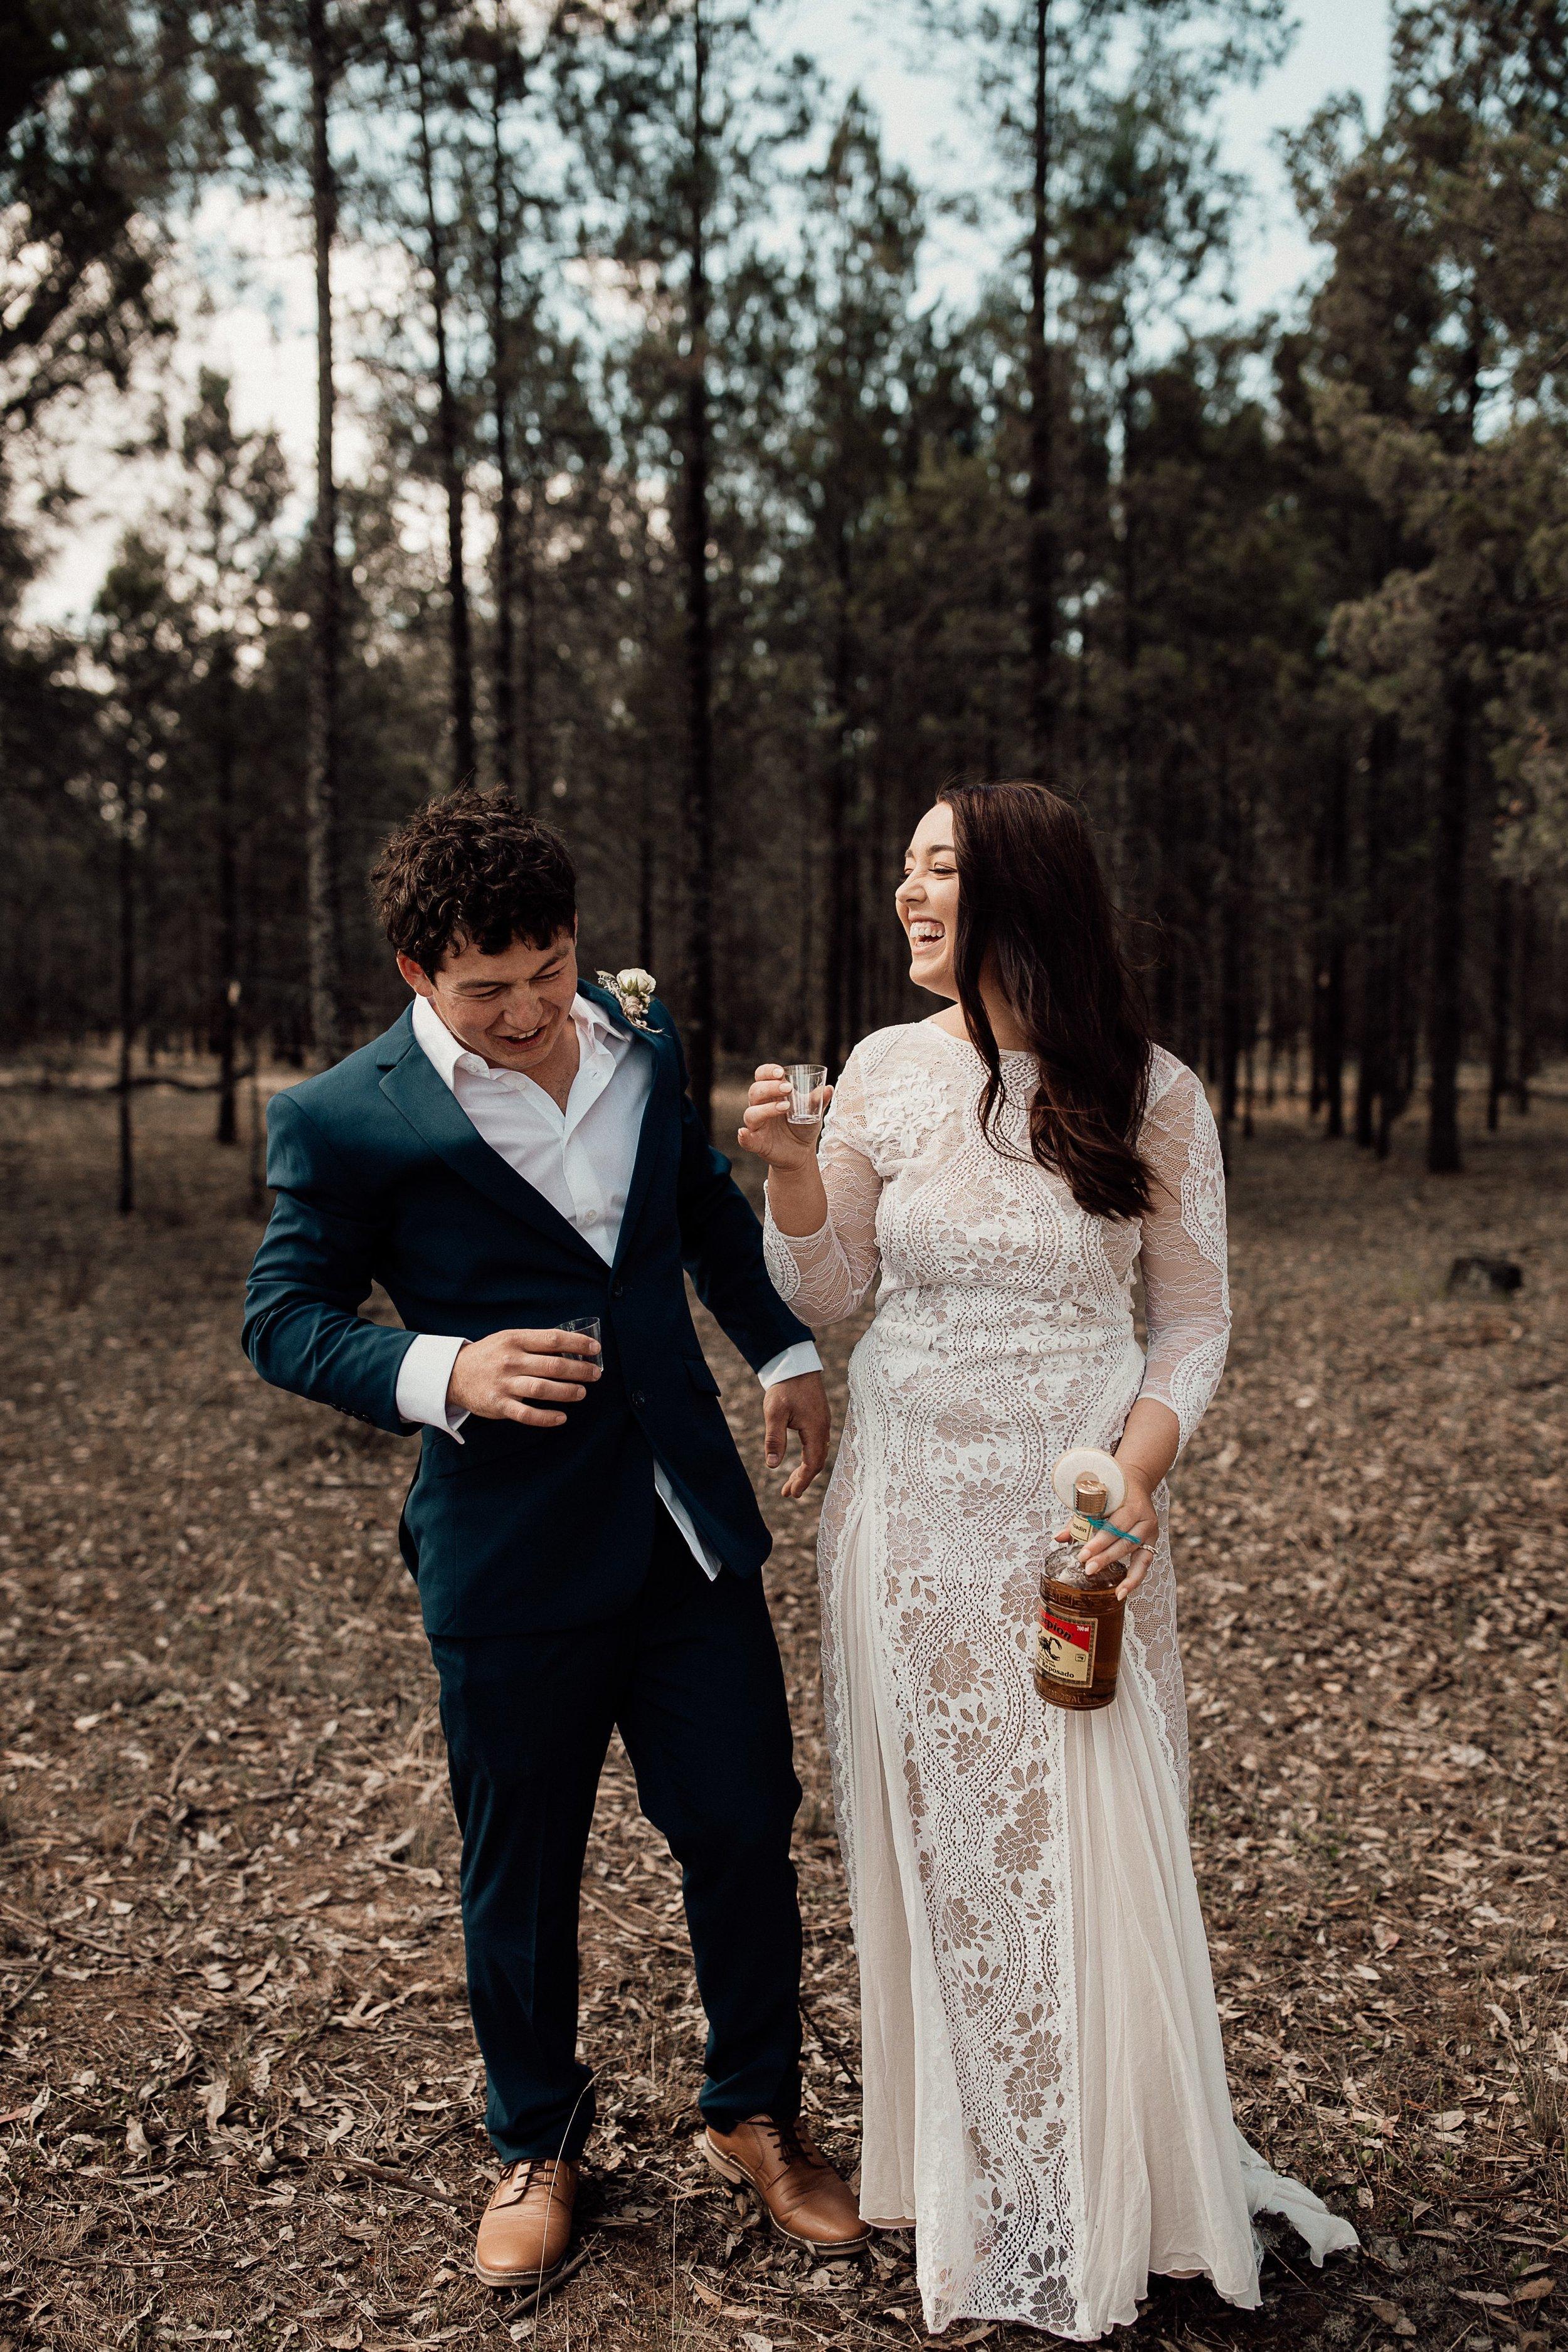 mickalathomas_puremacphotography_weddingphotographer_couplephotographer_Sheppartonphotographer_1507.jpg